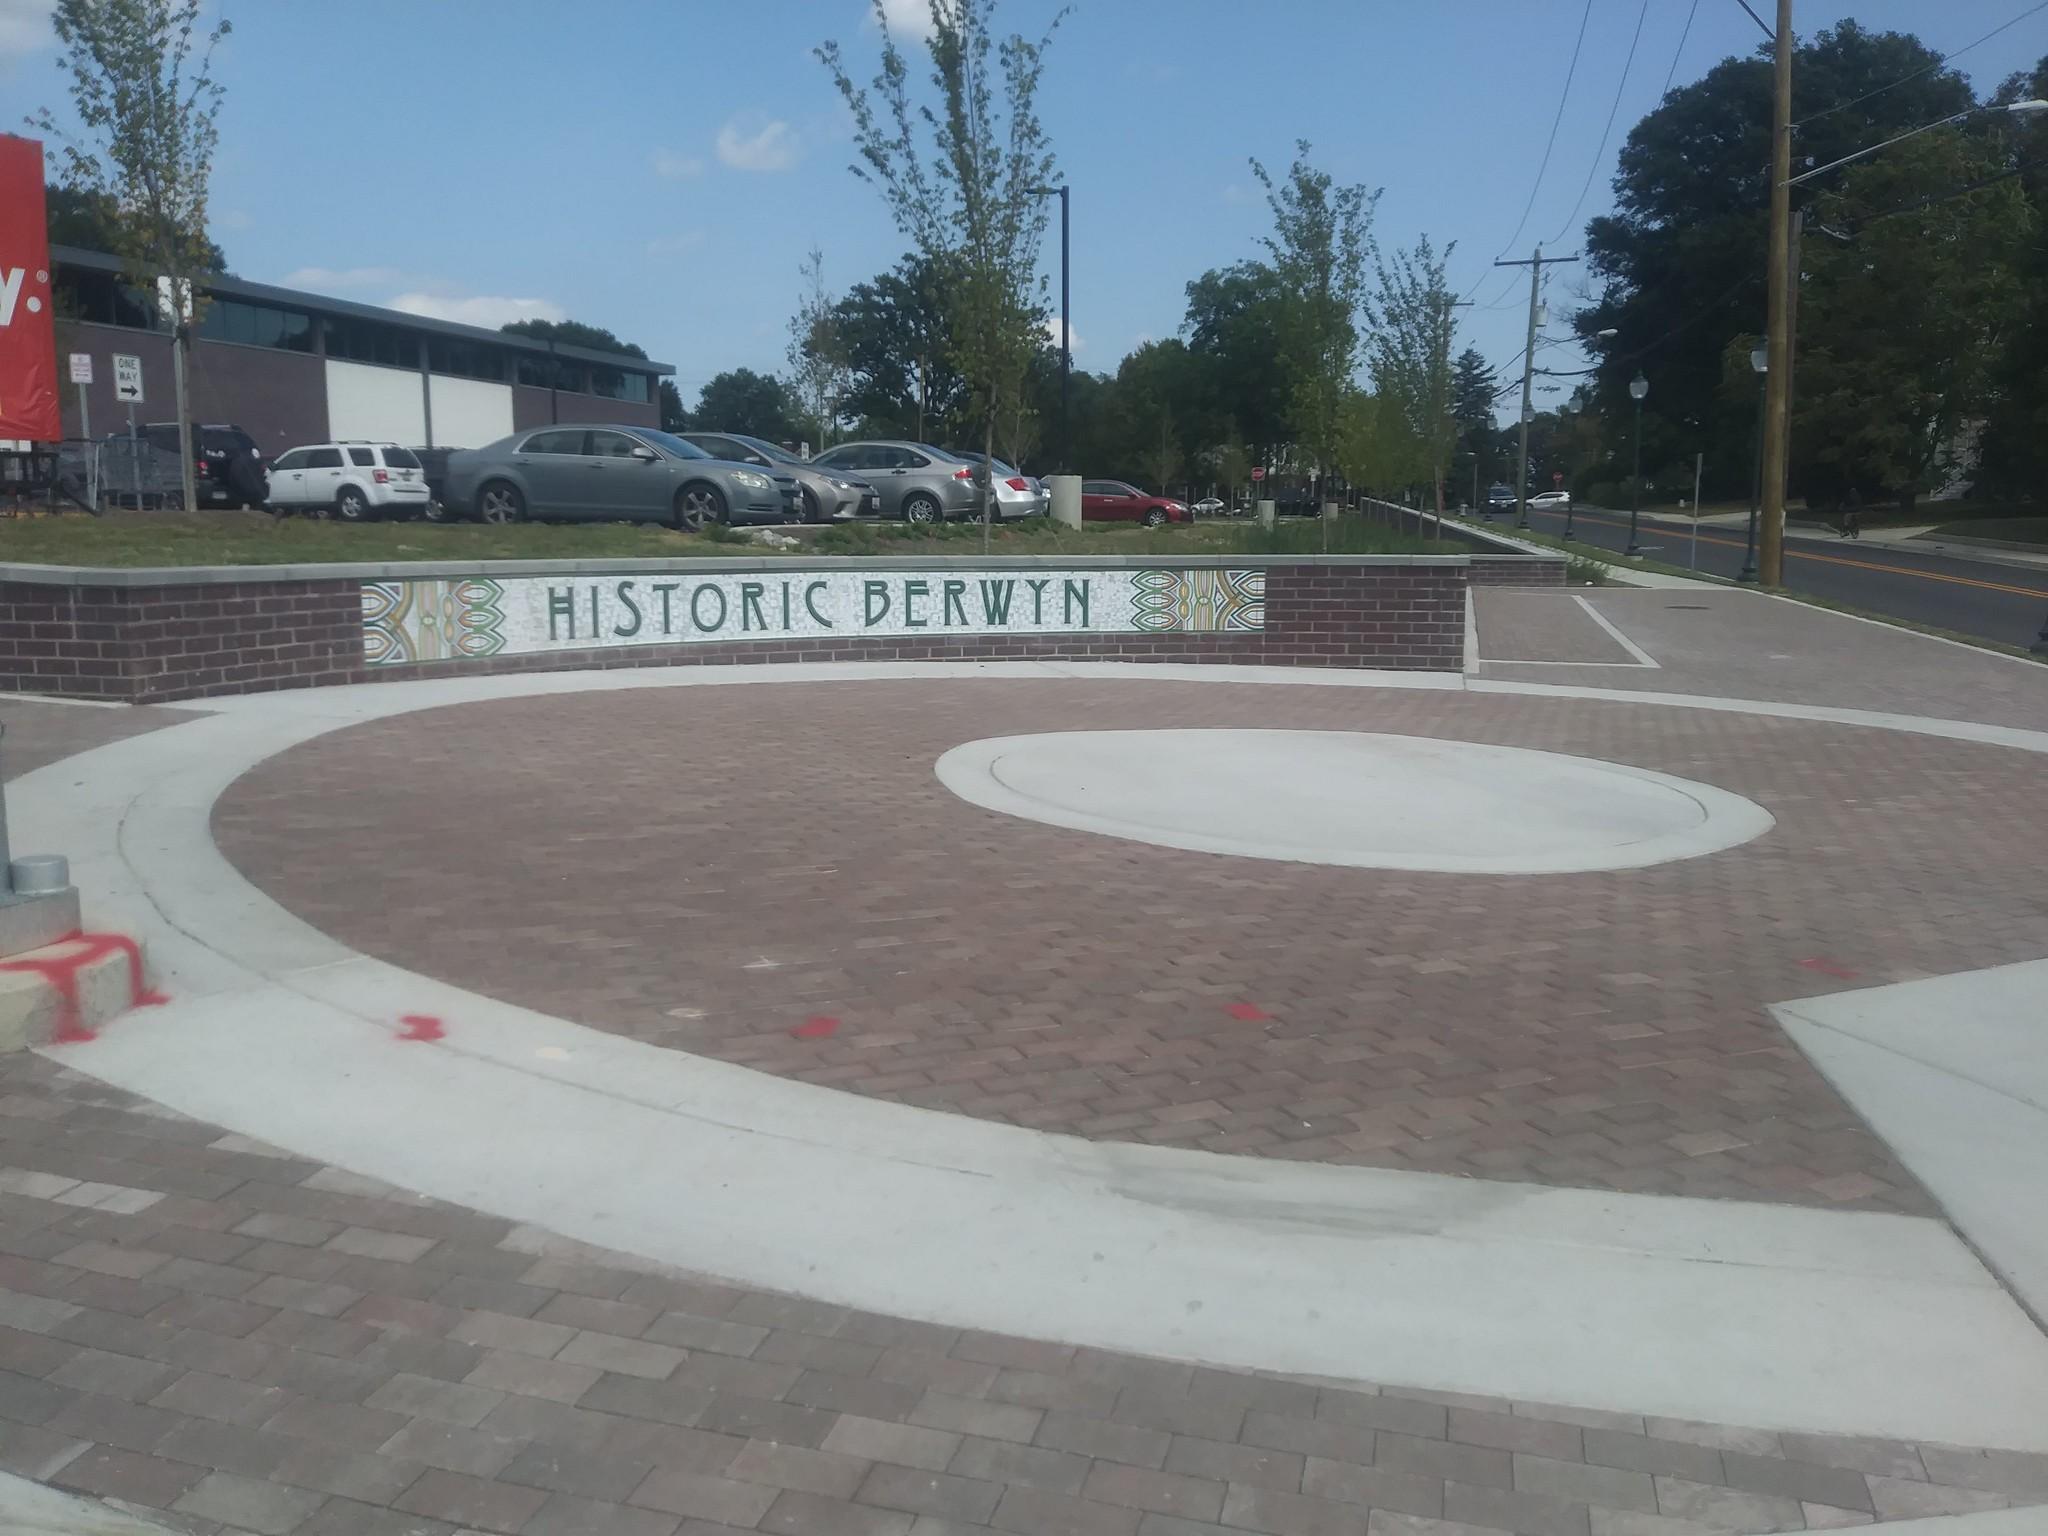 Special sidewalk intersection treatment in Berwyn, Maryland on Route 1